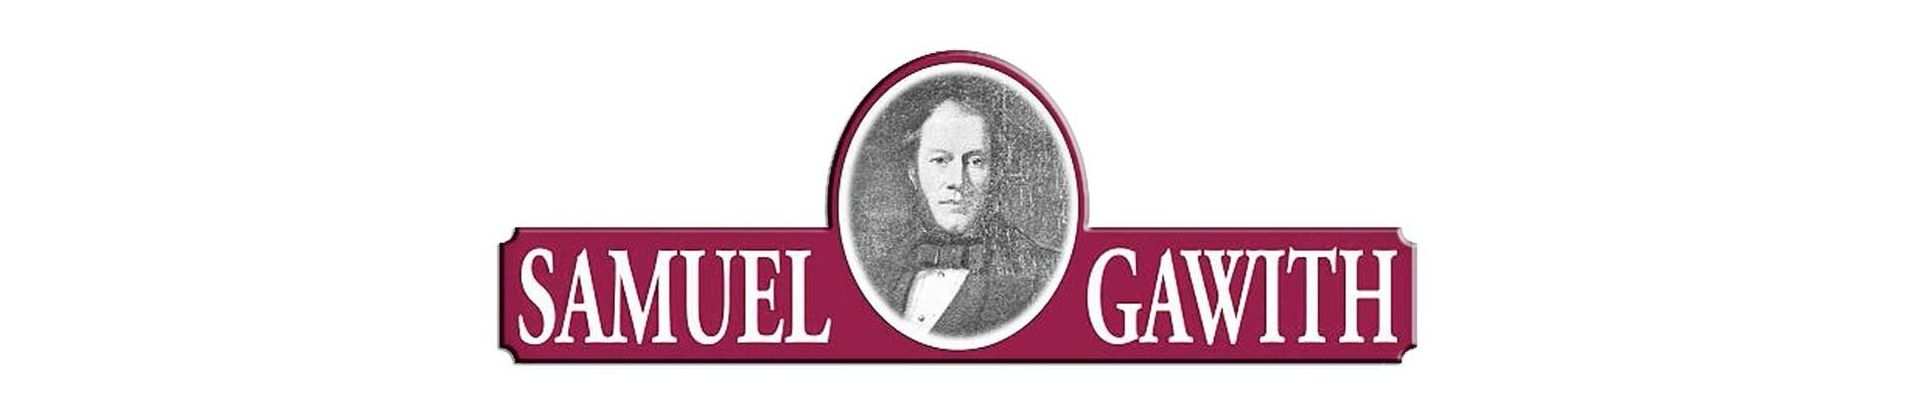 Tutun de pipa Samuel Gawith. Magazin tutun pentru pipa Samuel Gawith